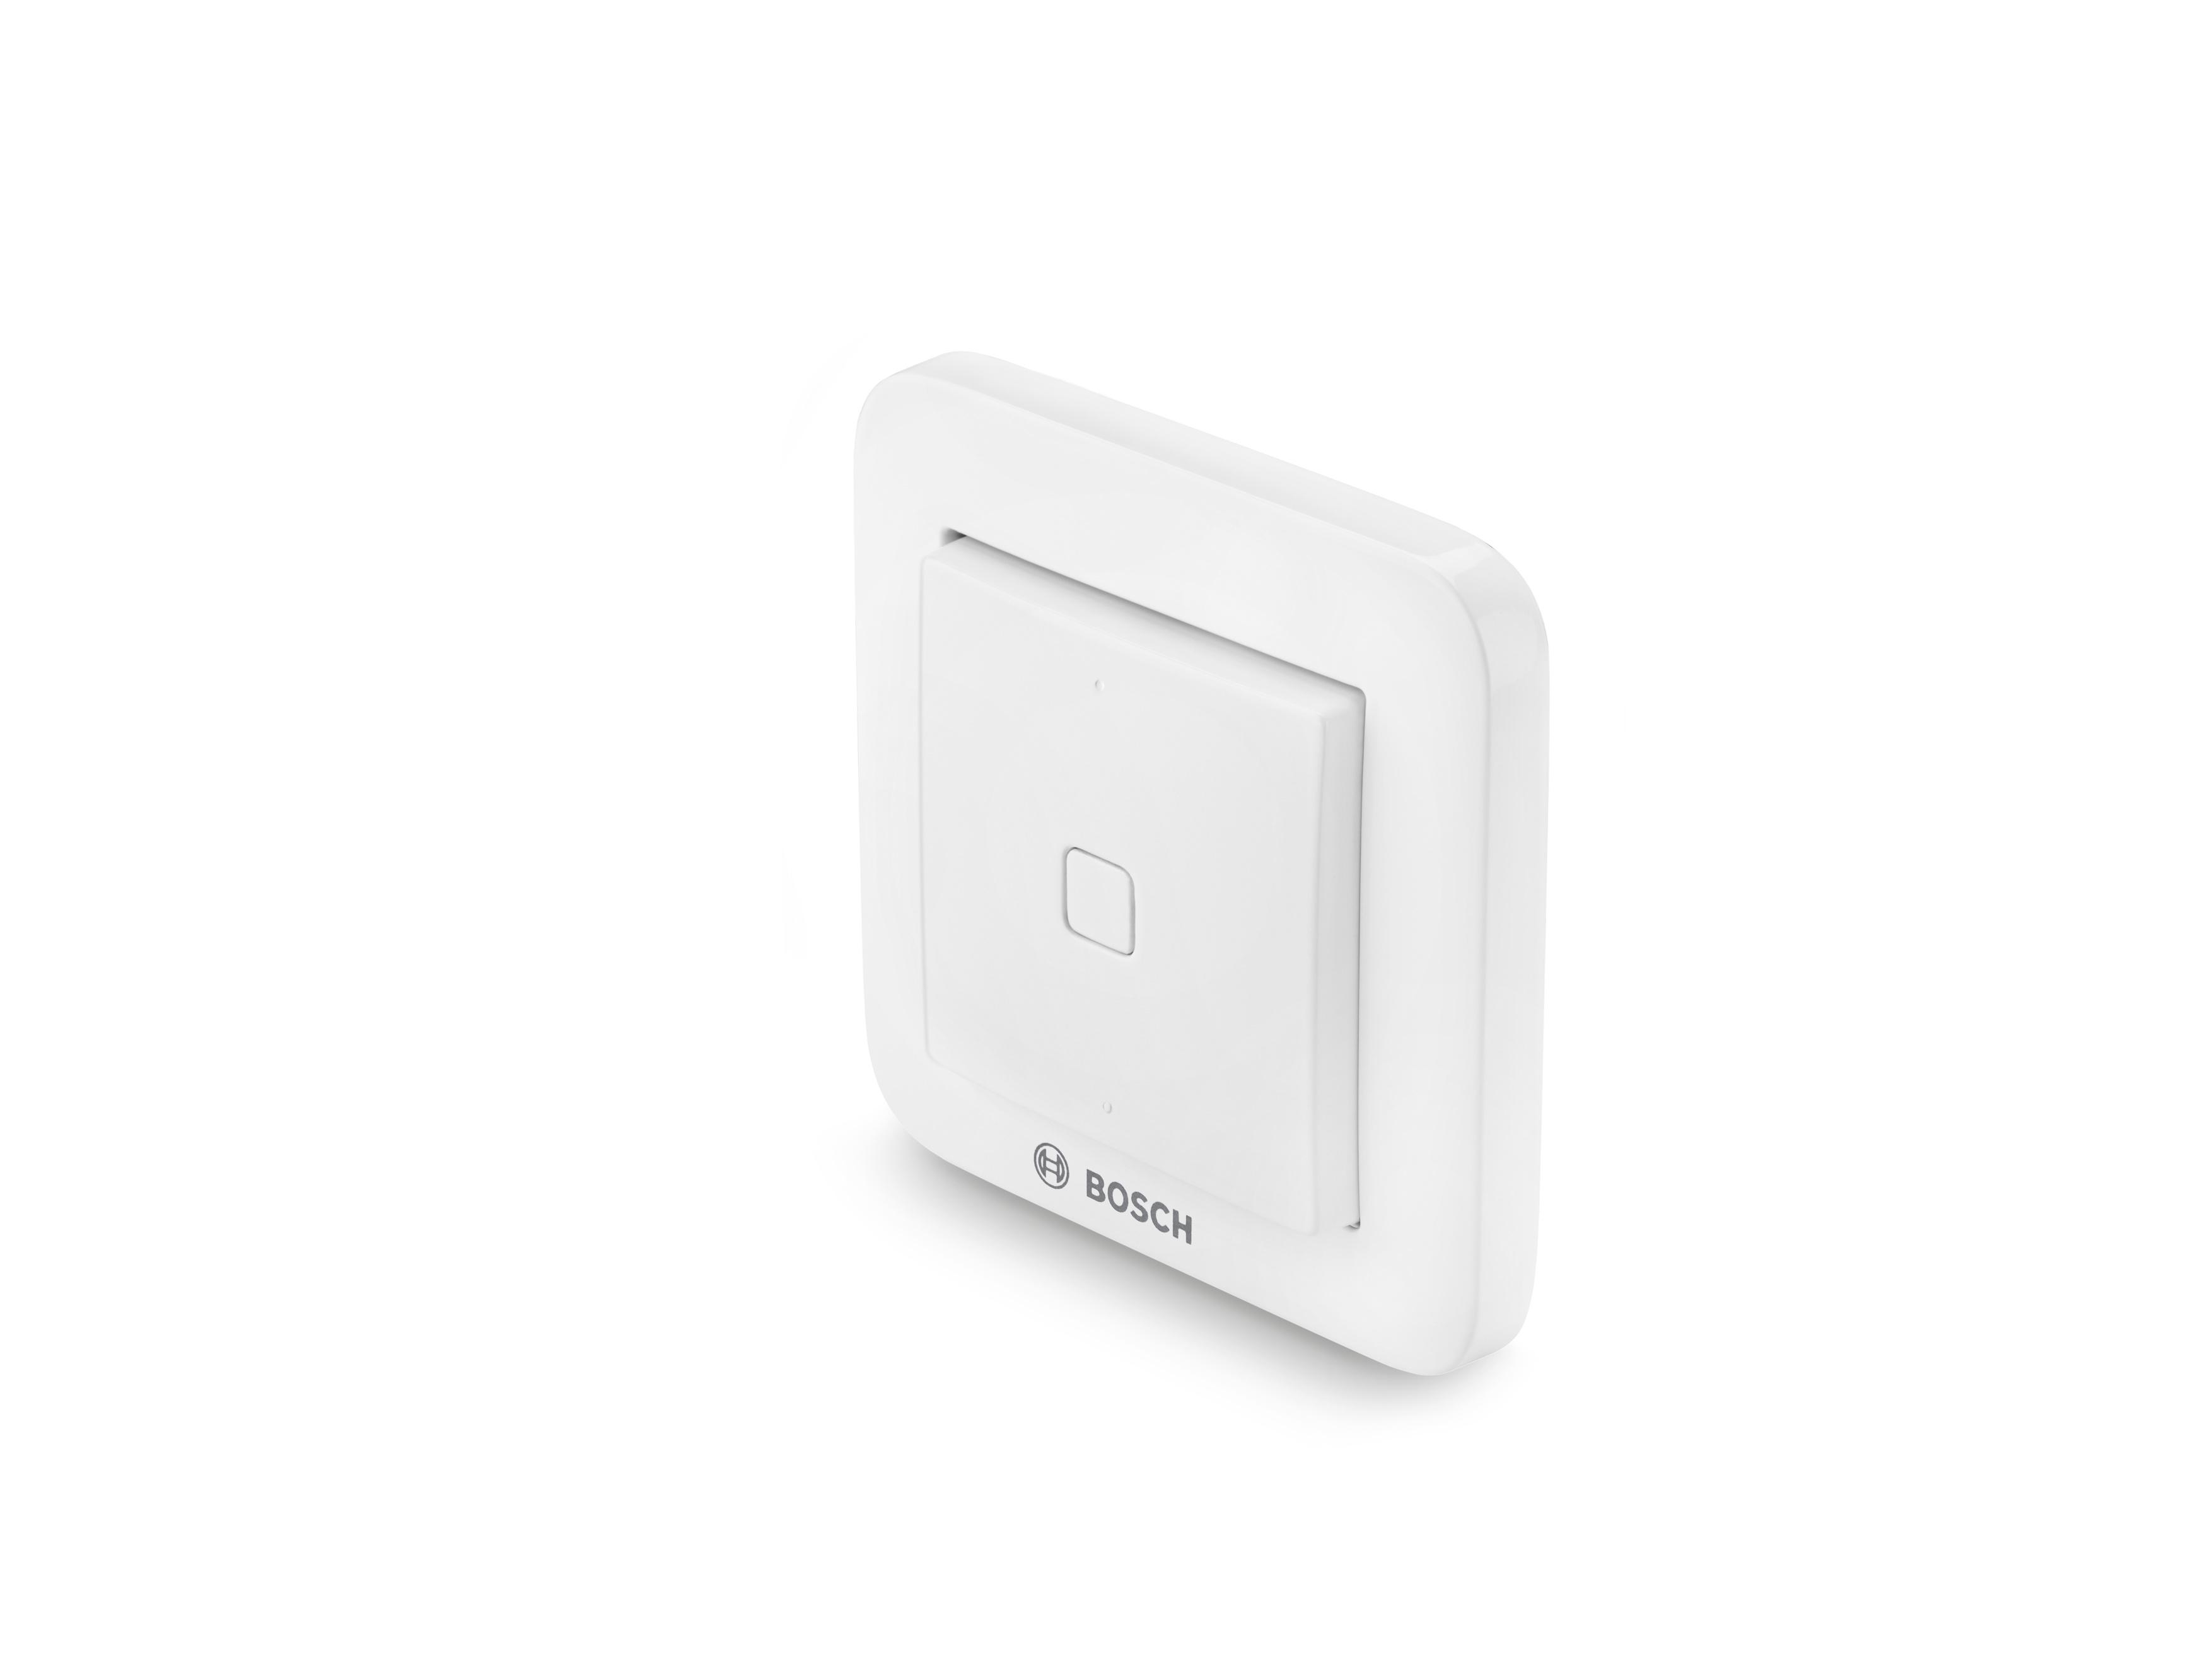 Bosch Smart Home - Universalschalter